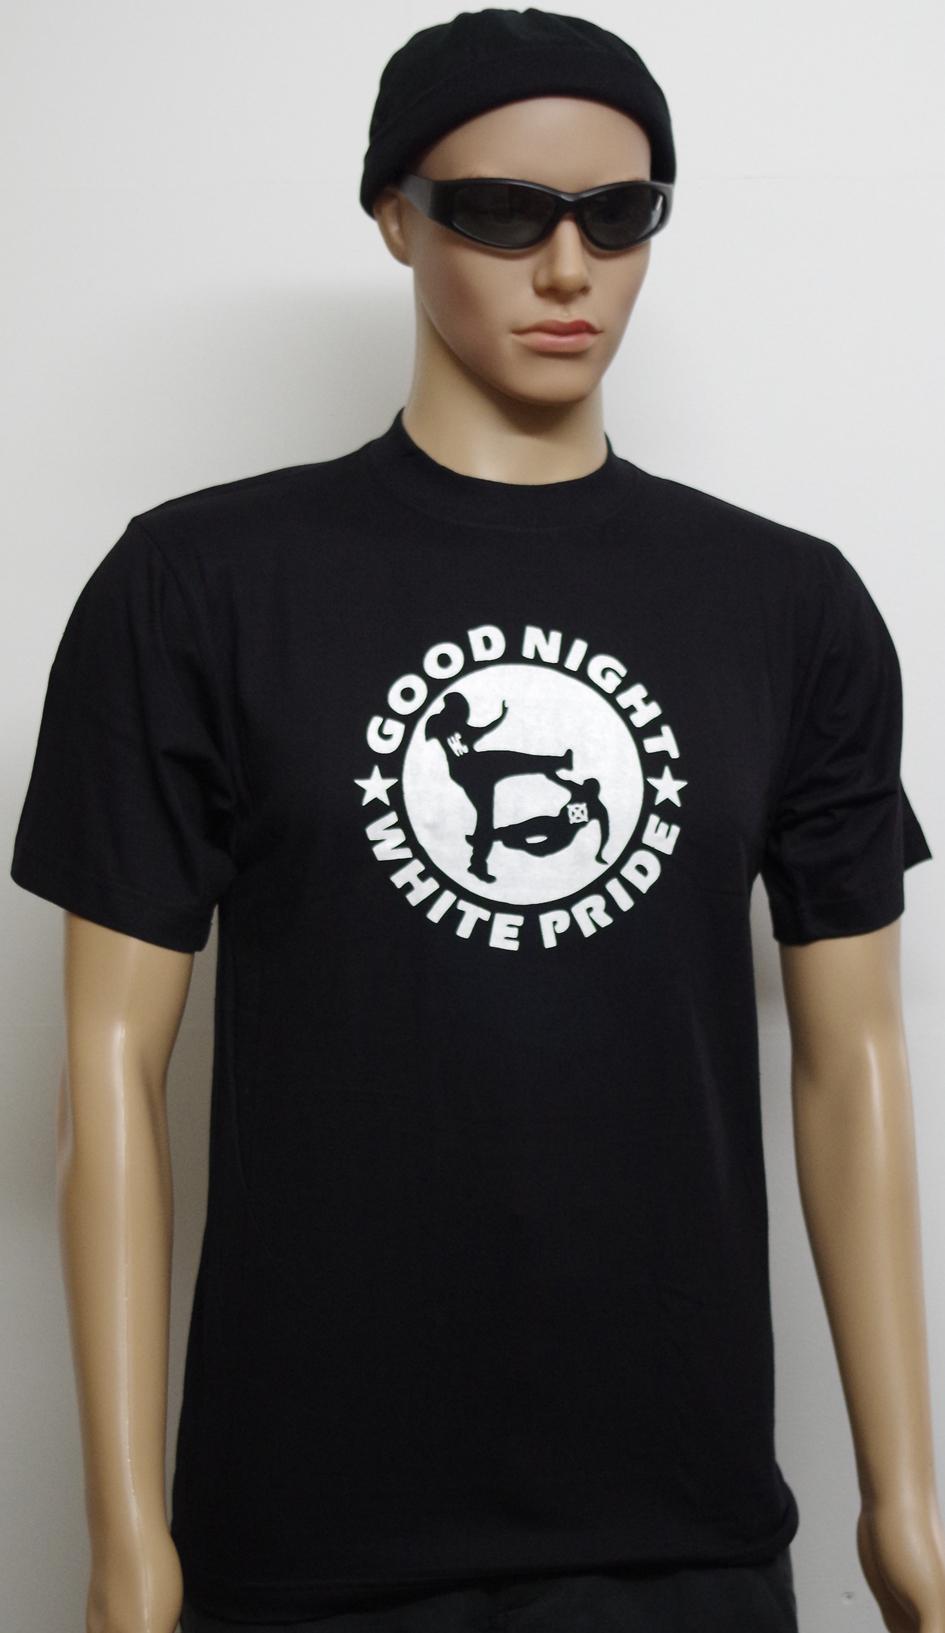 t shirt good night white pride politik punk u schlaue spr che t shirts m nner. Black Bedroom Furniture Sets. Home Design Ideas